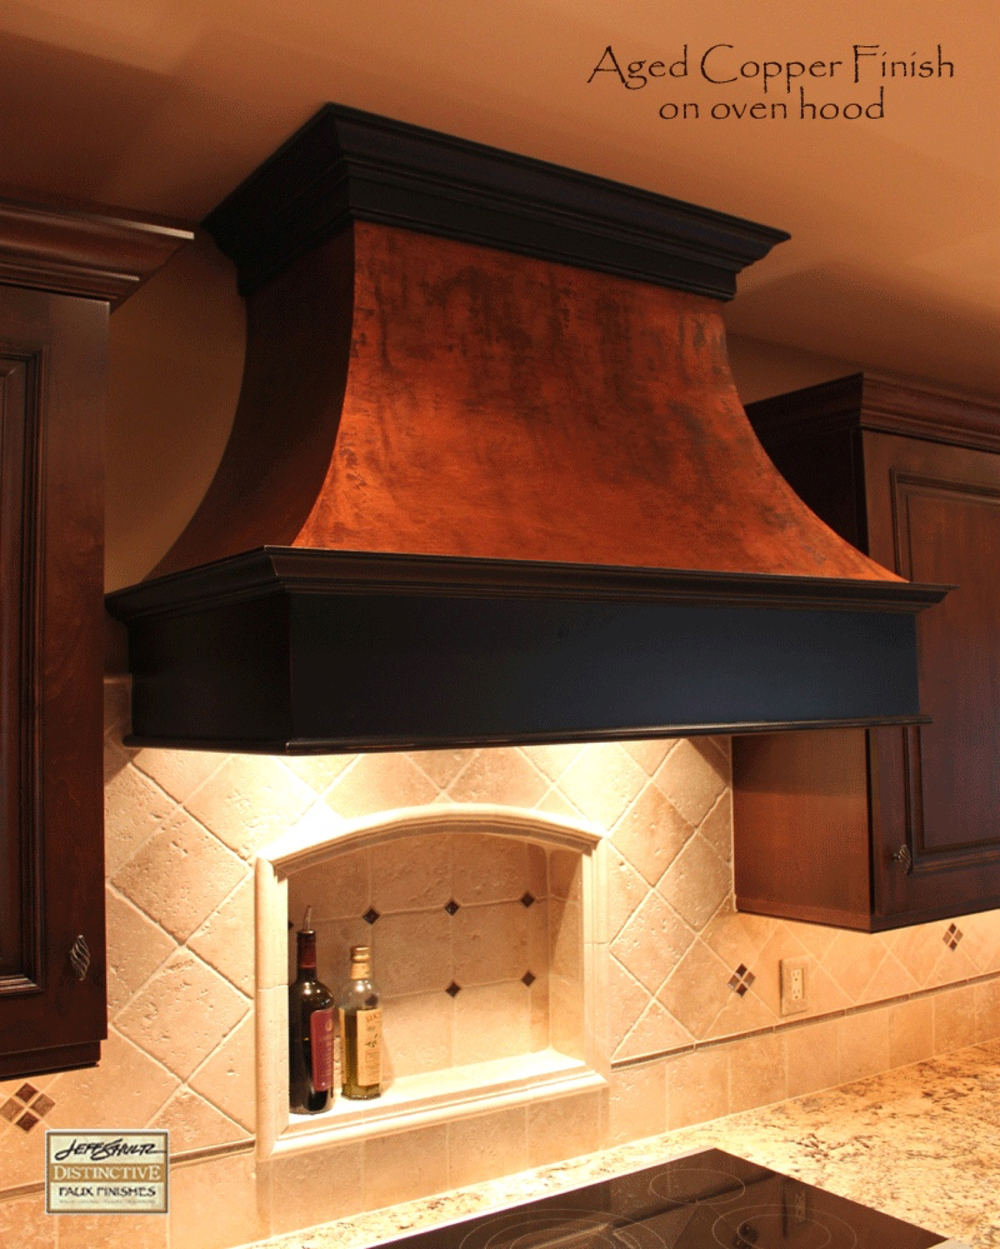 hp-ovenhood-copper.jpg